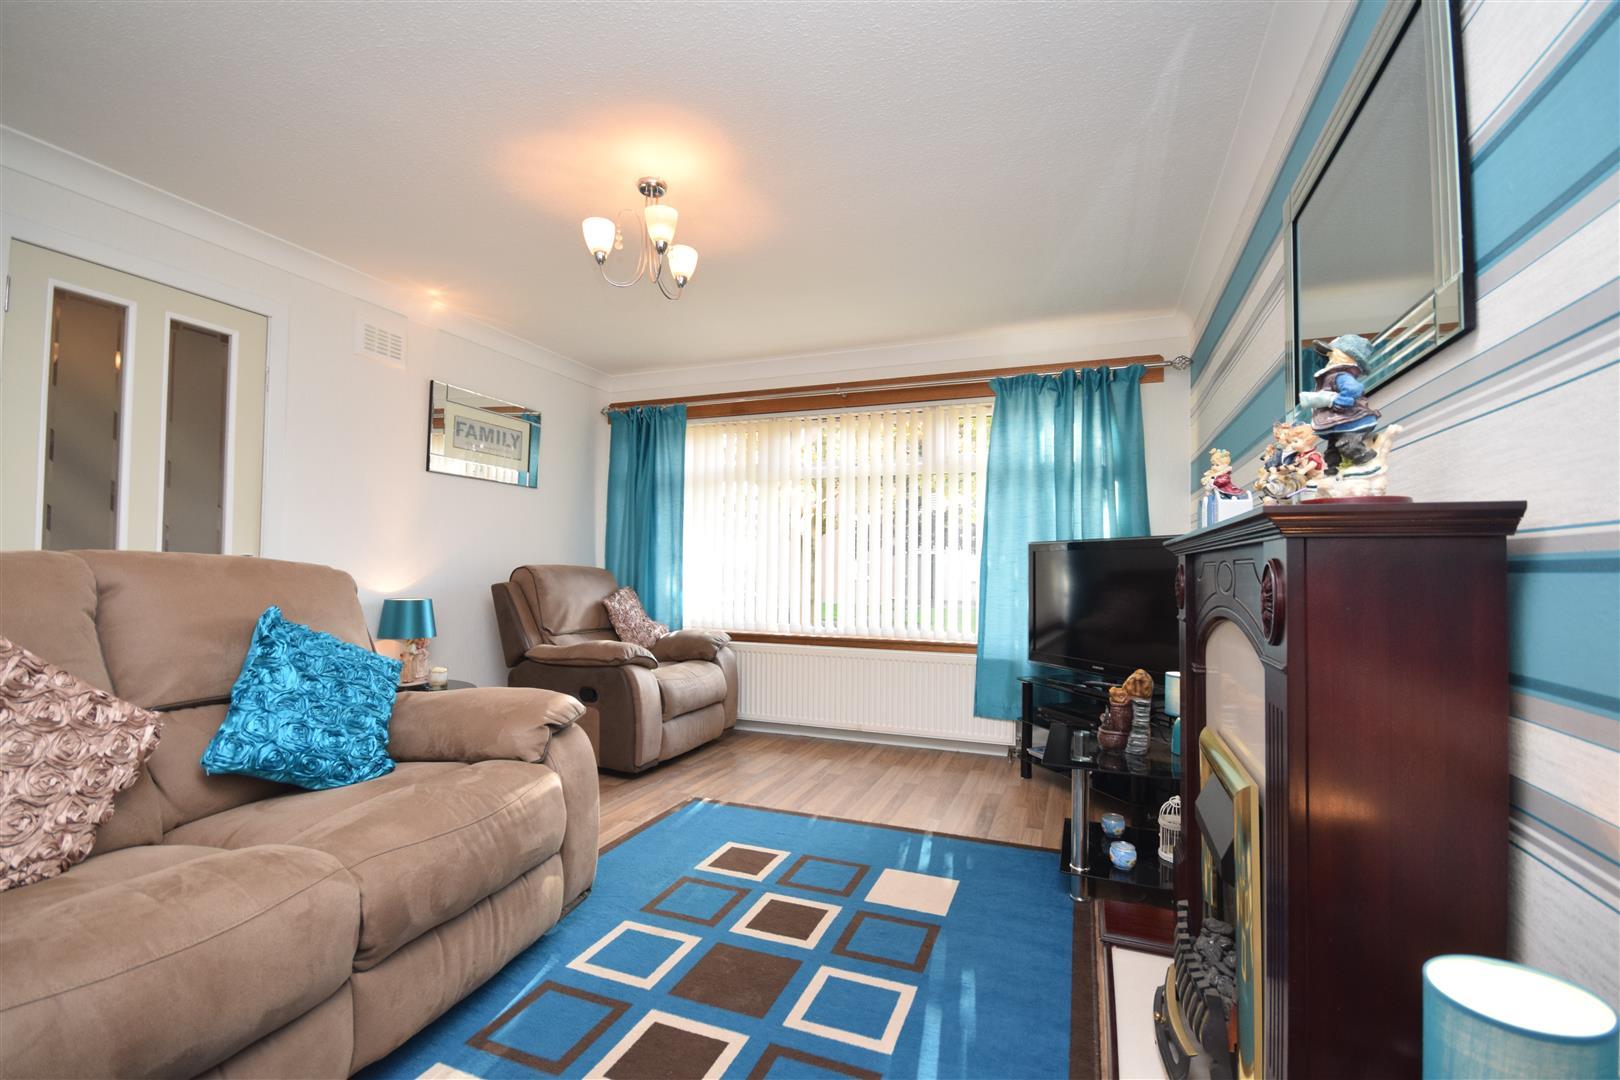 84, Mull Place, Perth, Perthshire, PH1 3DP, UK